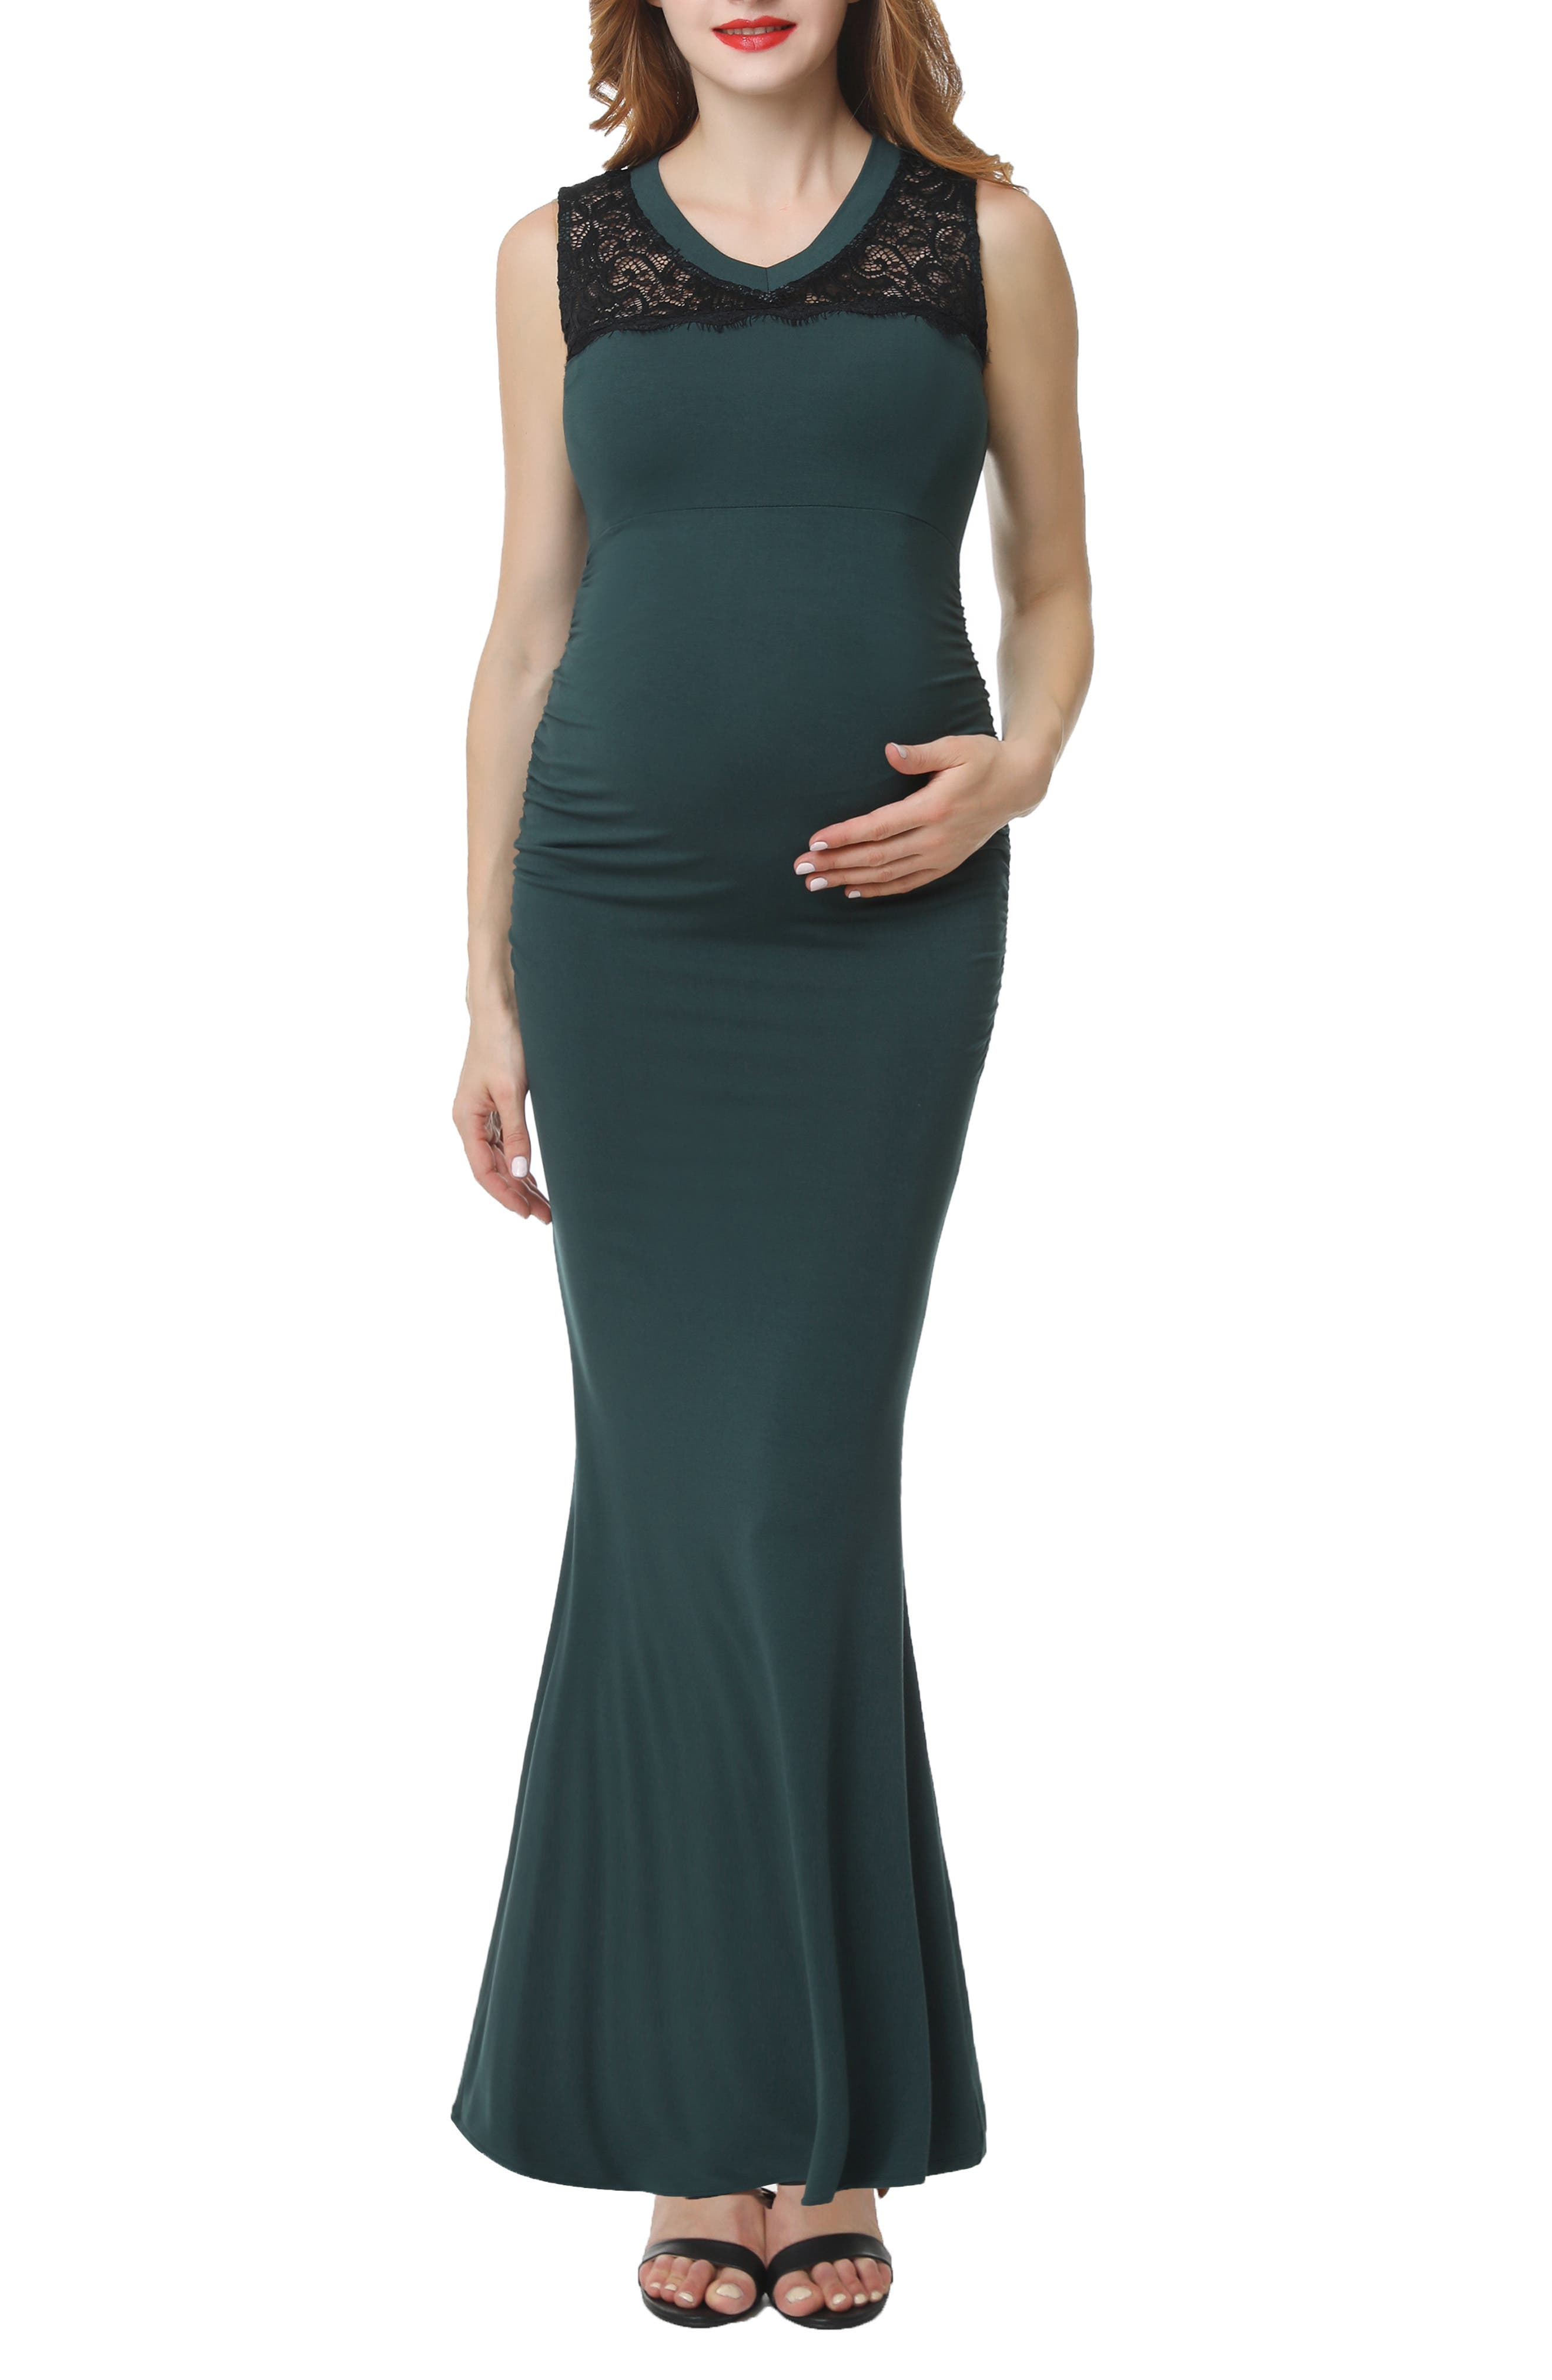 Tilda Maternity Mermaid Gown